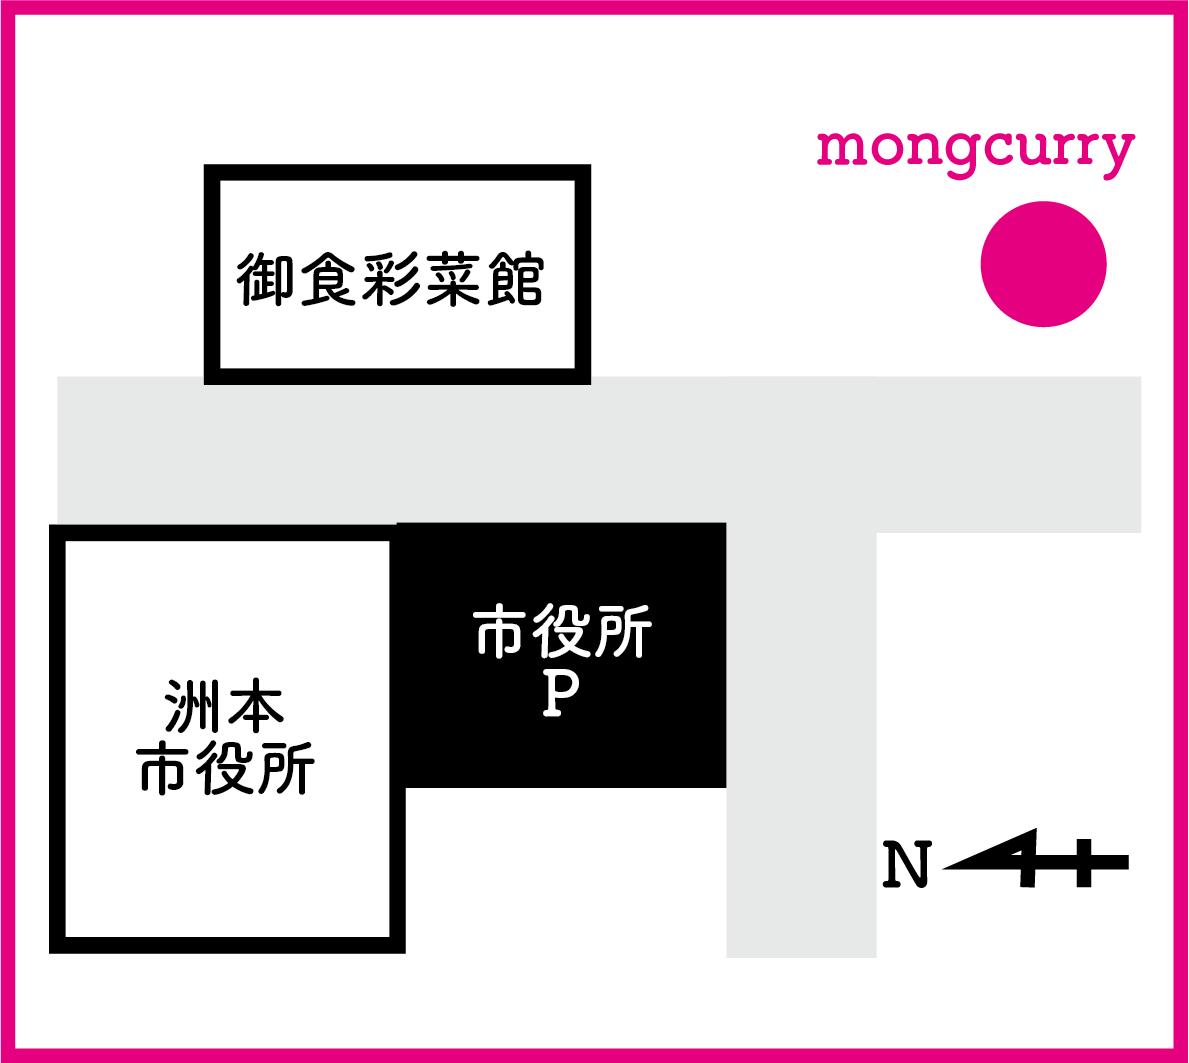 mongcurry